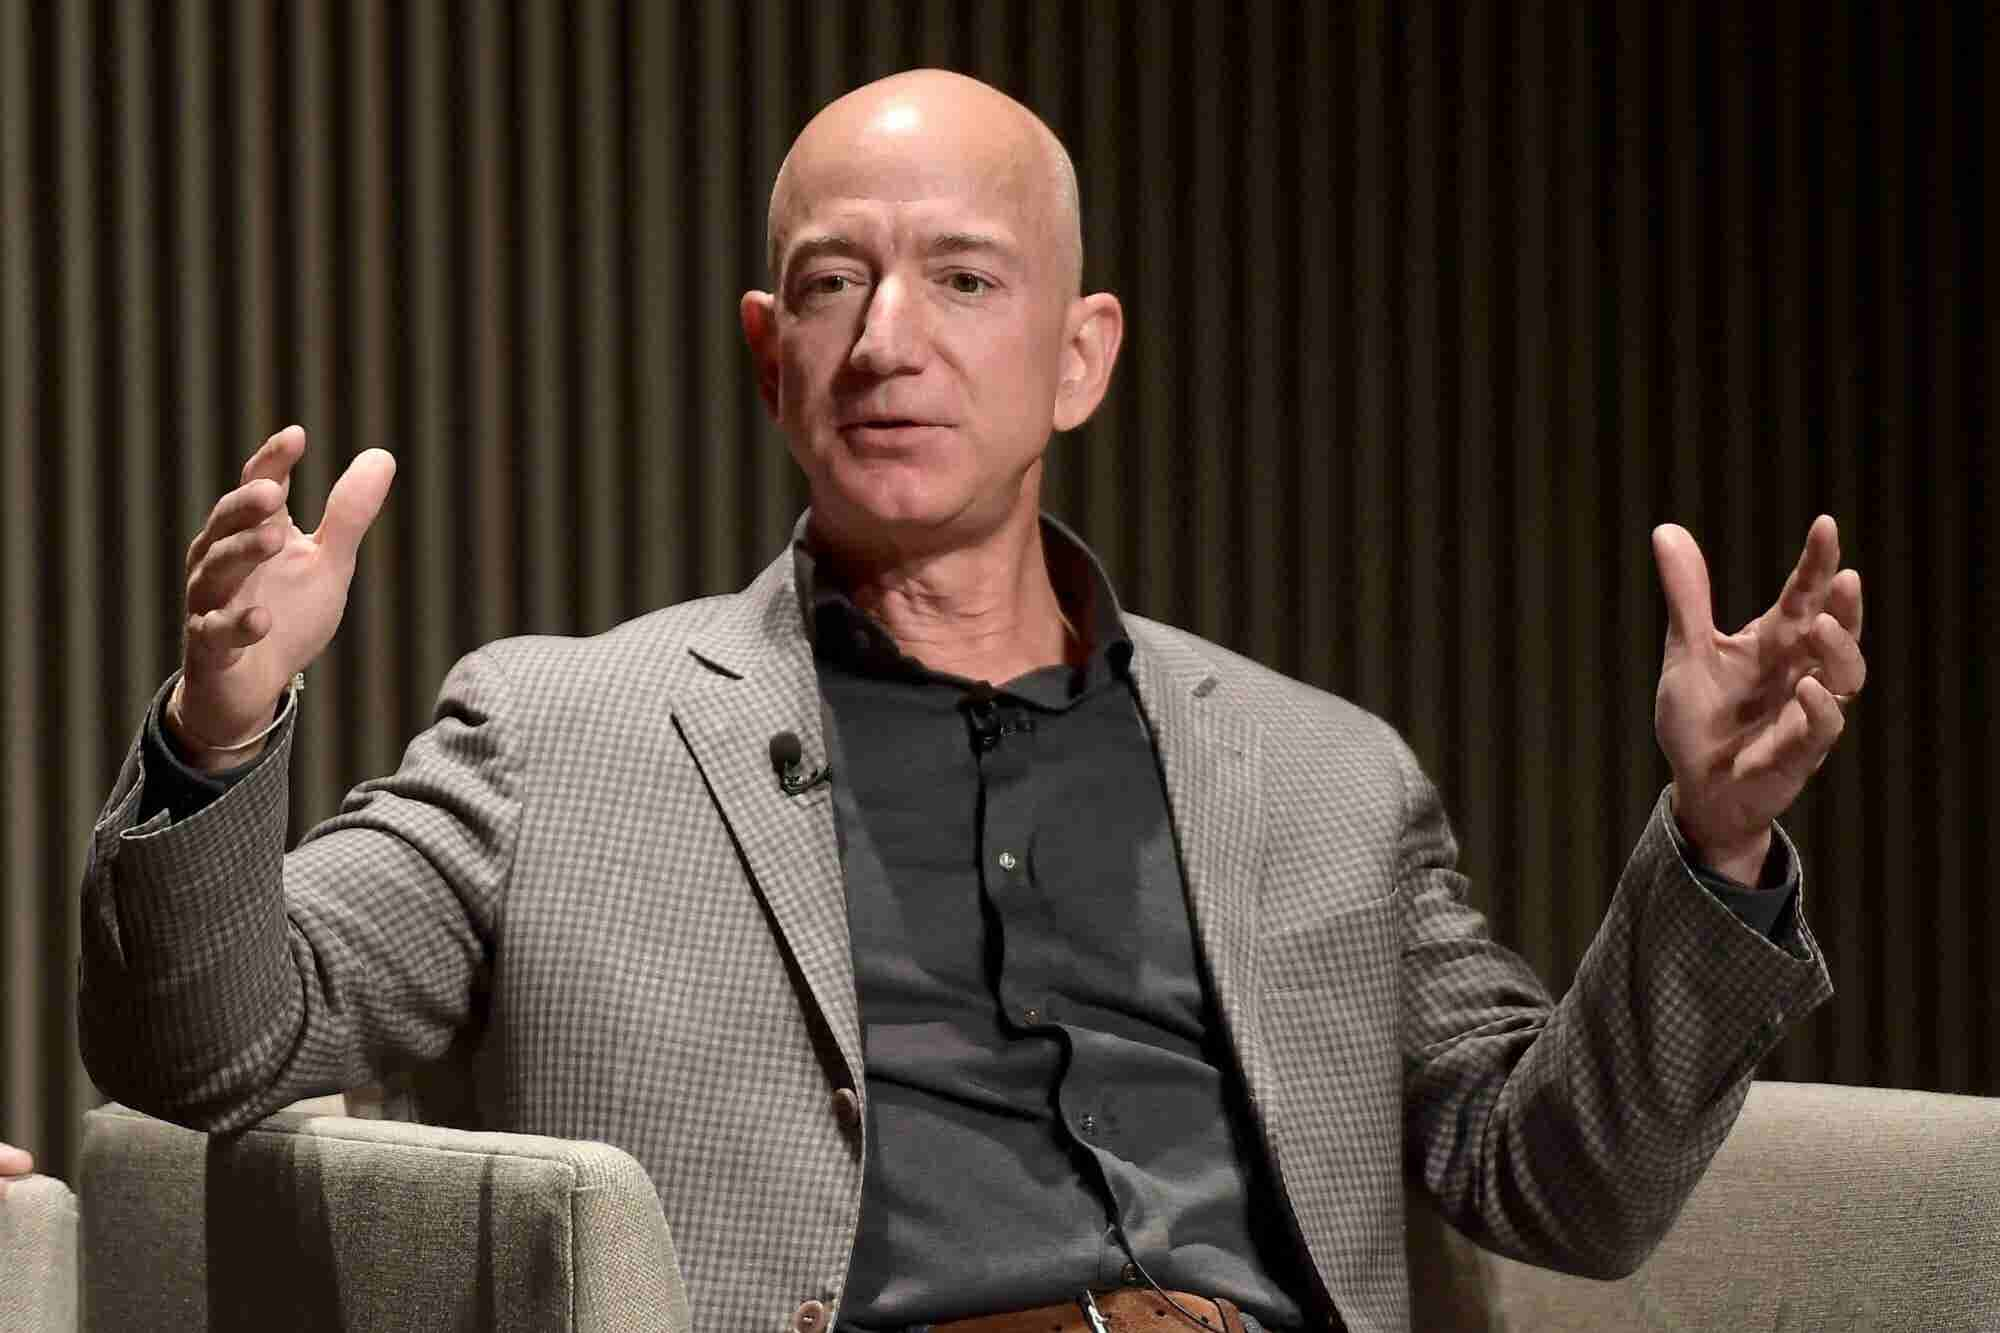 Billionaires Like Warren Buffett, Jeff Bezos and Mark Cuban Live by Ancient Stoic Philosophy